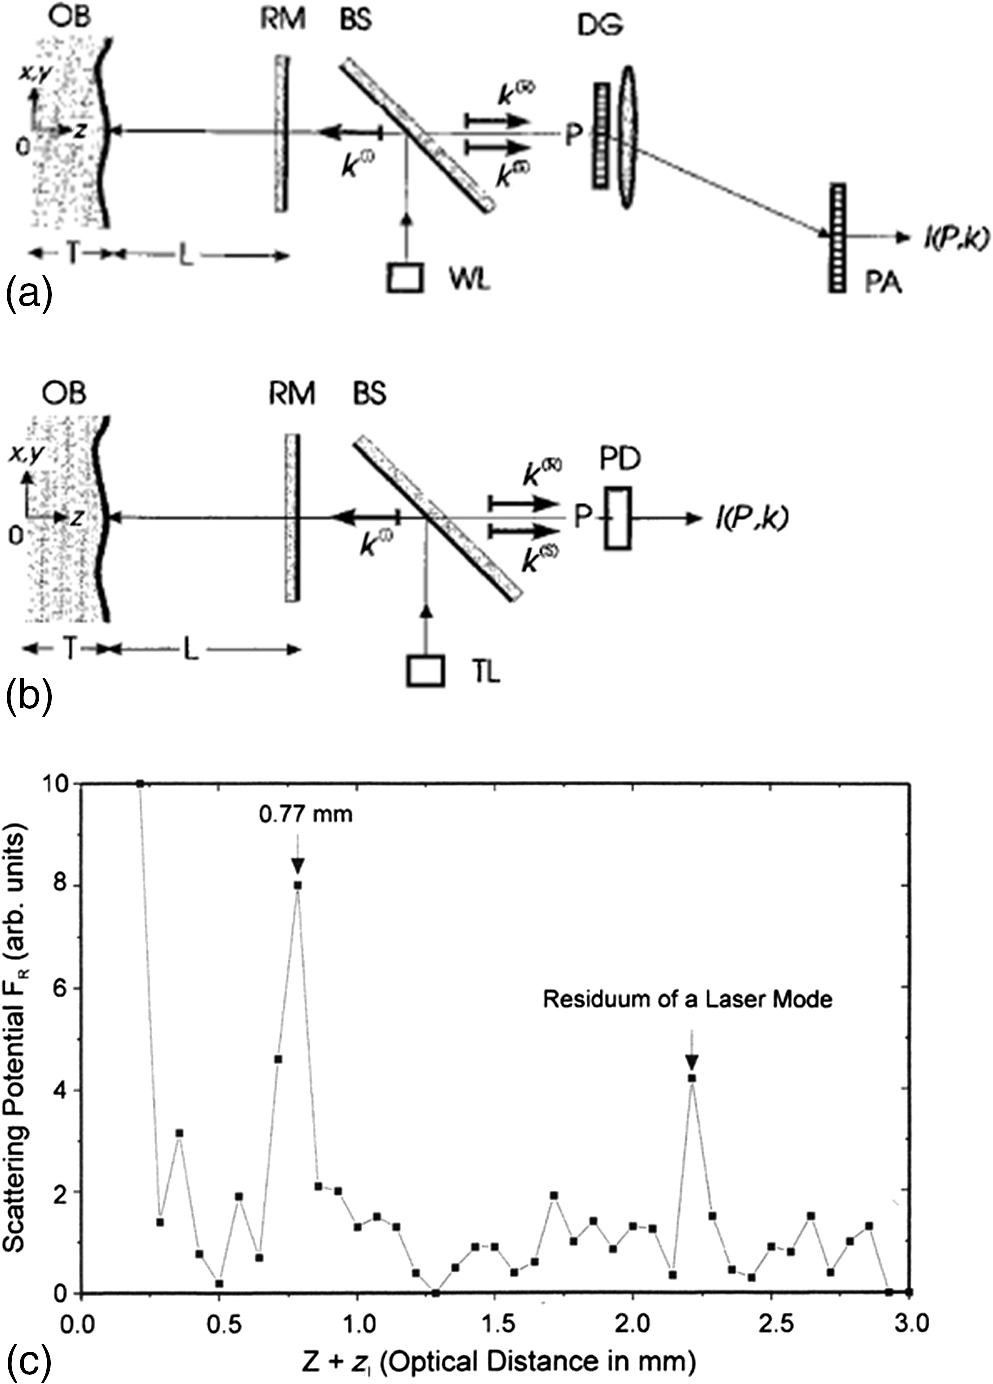 1986 Phantom 164 Wiring Diagram Schematic Diagrams Bass Cat Adolf Friedrich Fercher A Pioneer Of Biomedical Optics